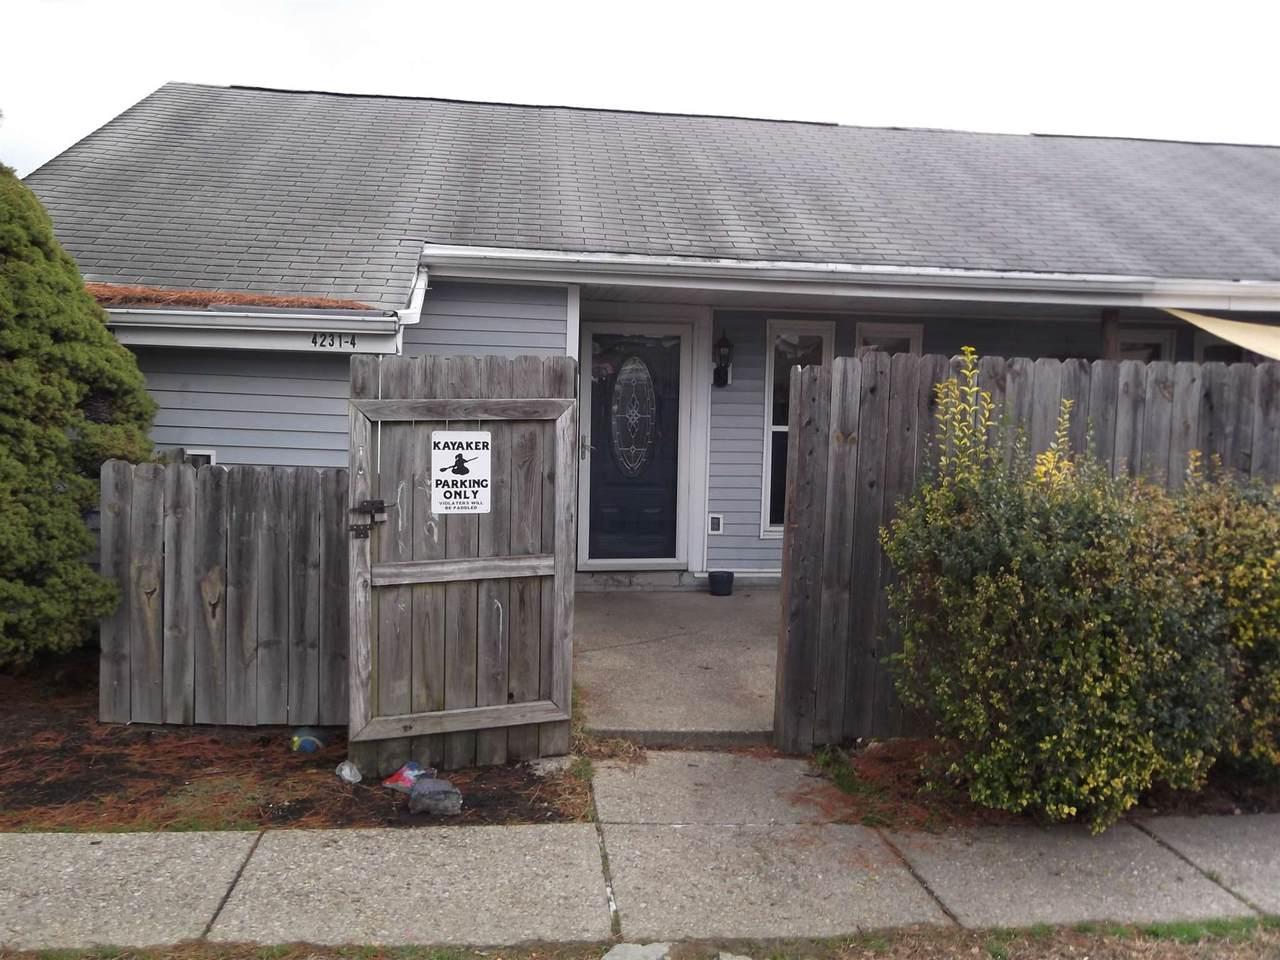 4231 Briarwood Drive - Photo 1